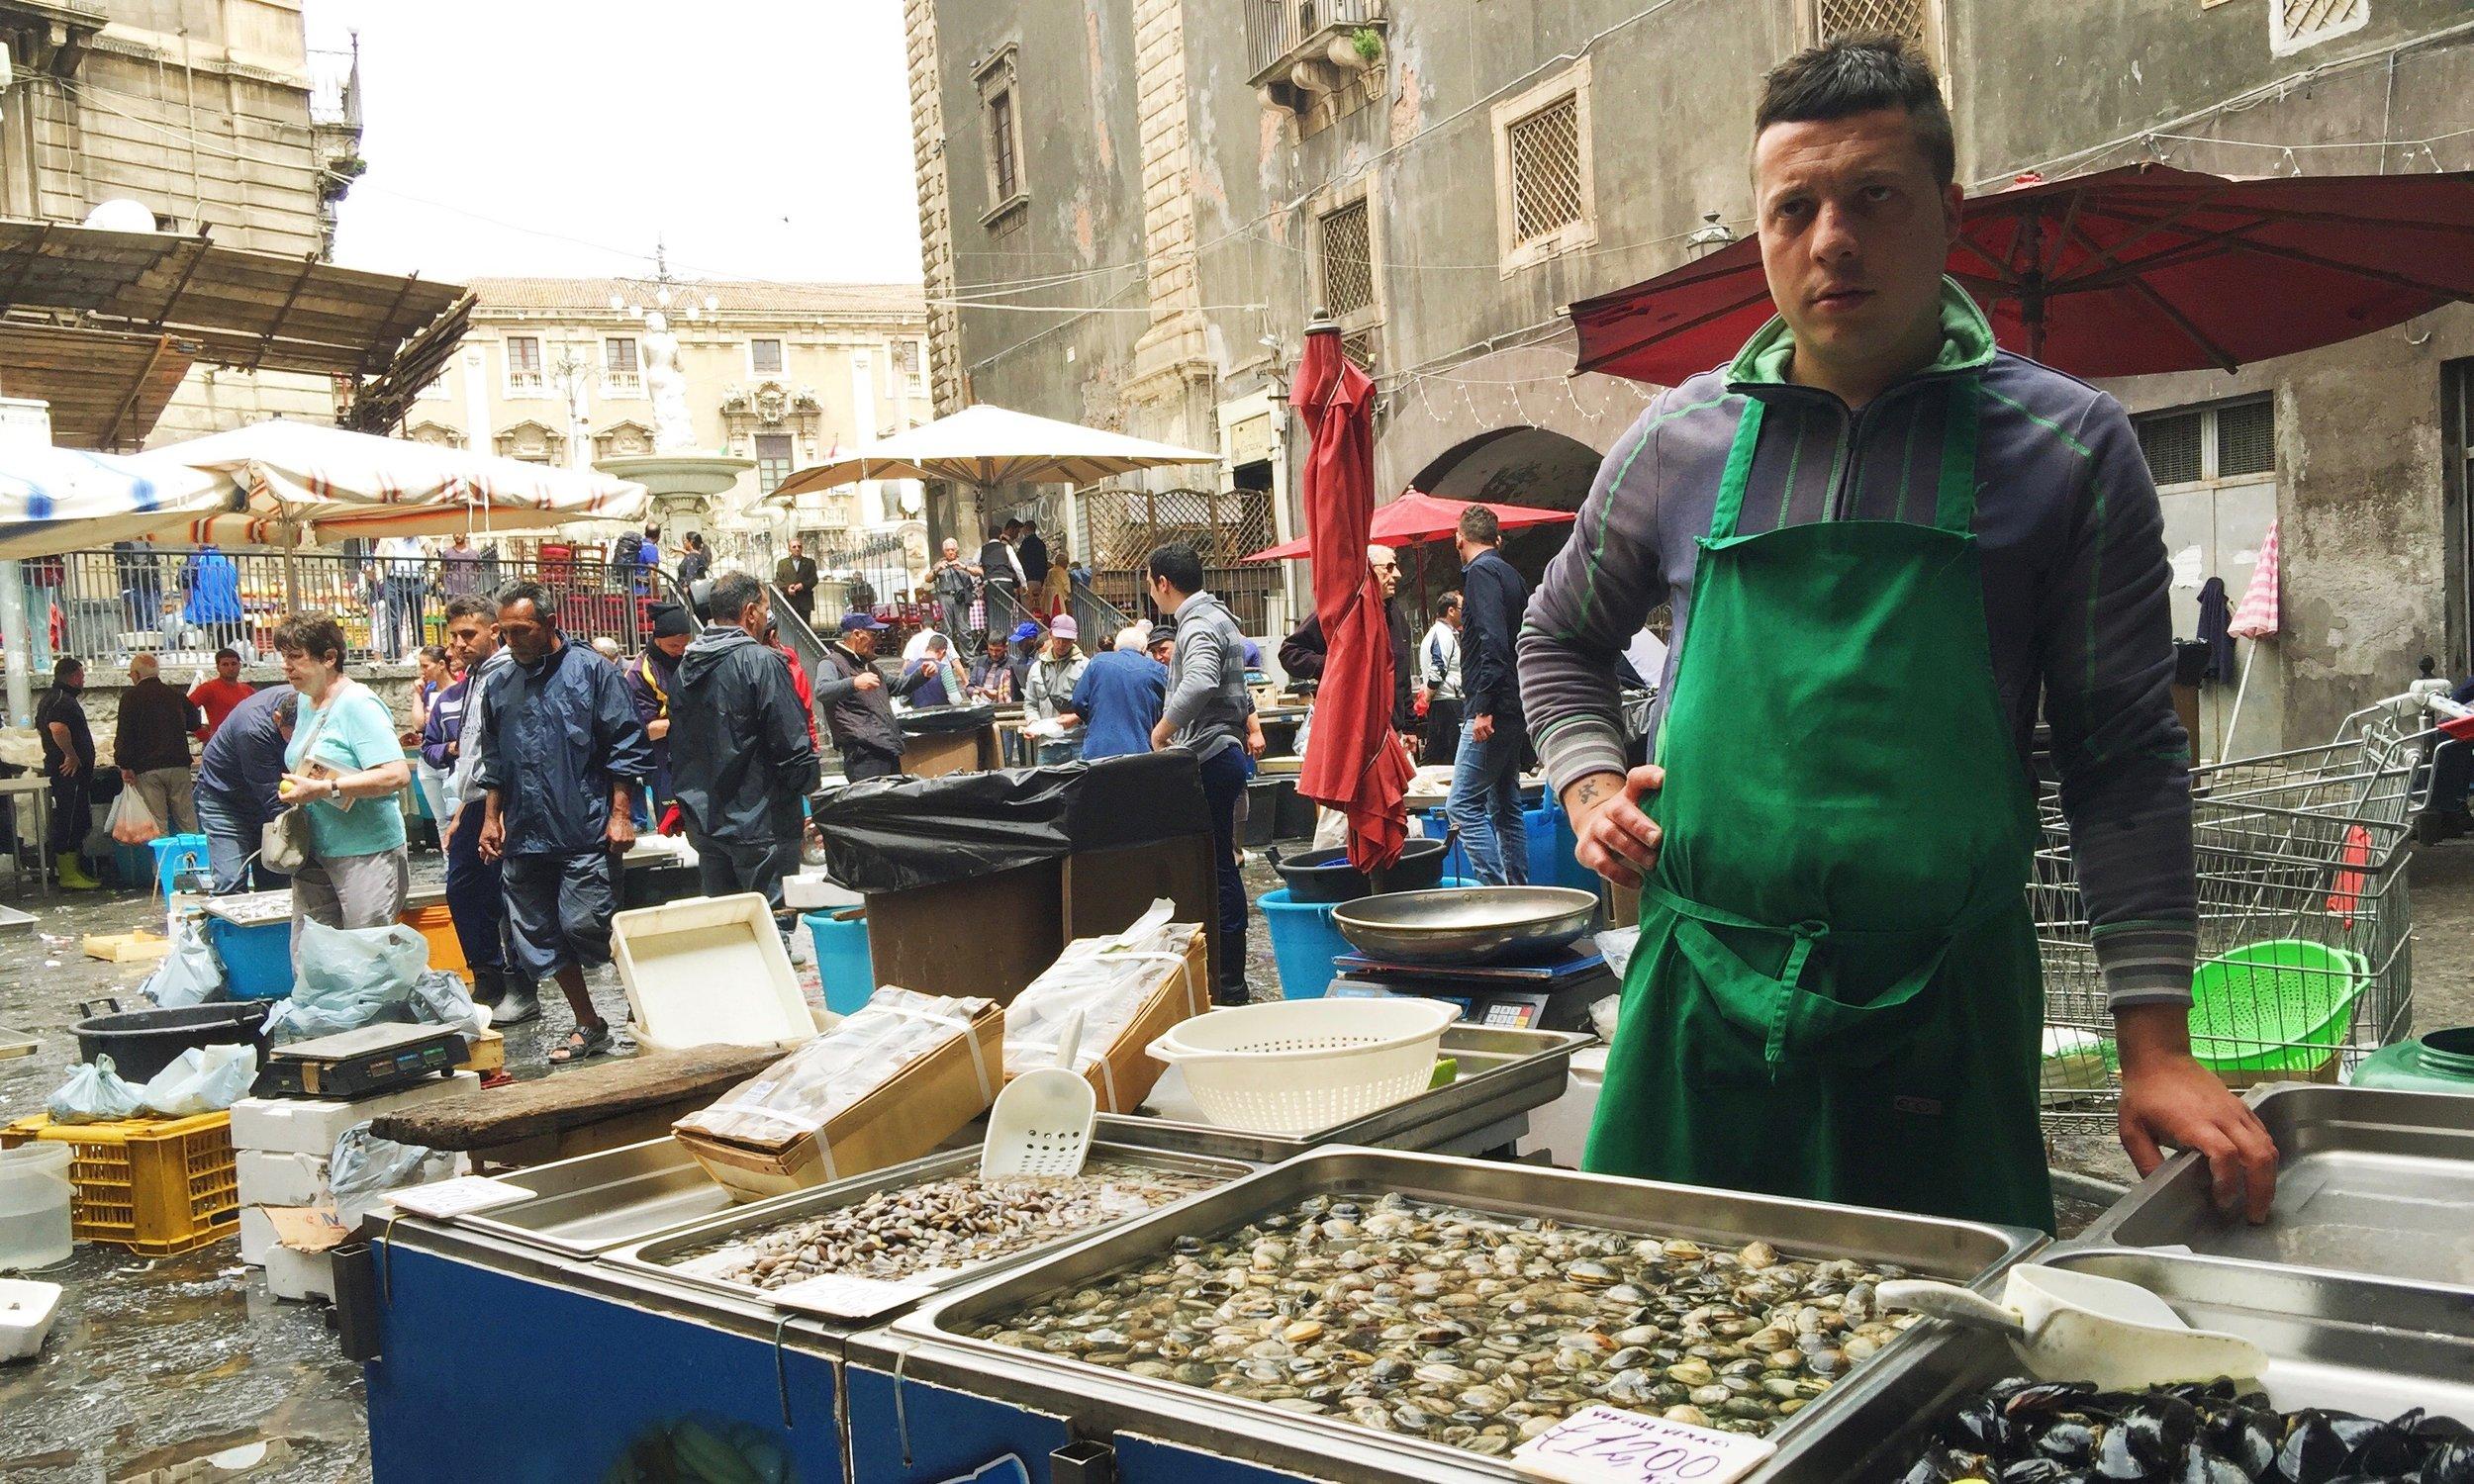 The historic fish market by Piazza del Duomo.